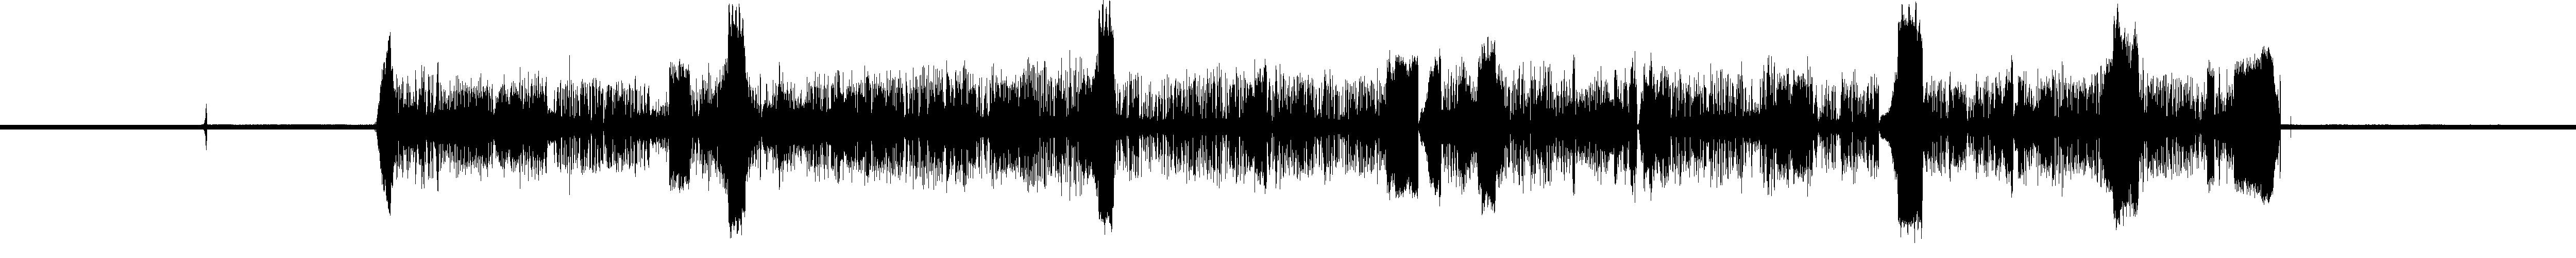 Waveform download